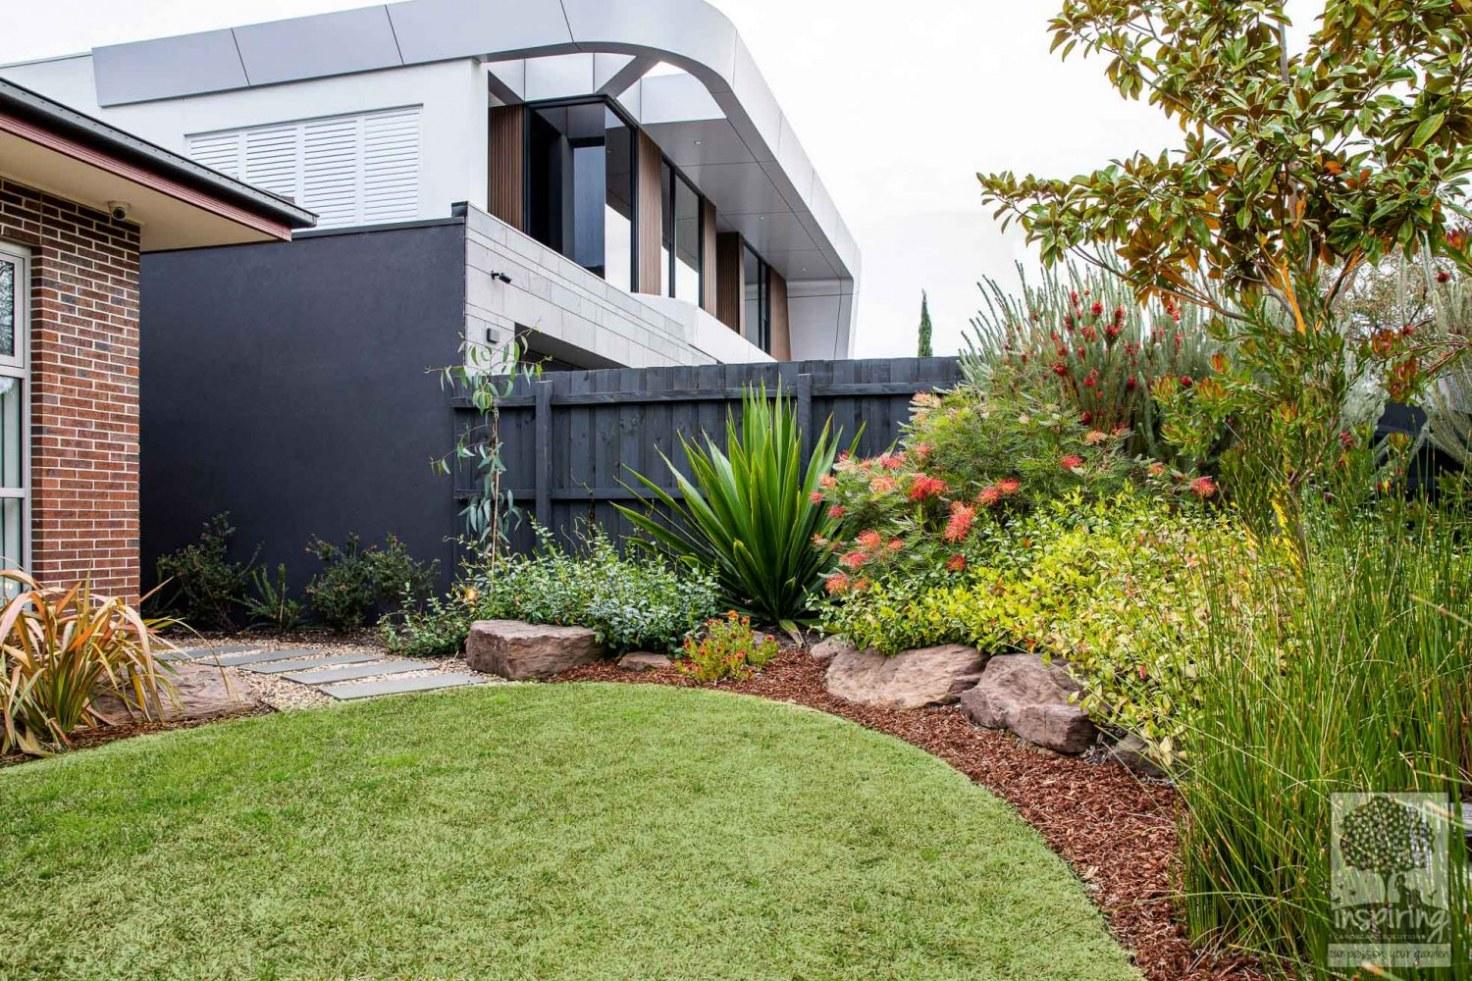 Corner view of Glen Waverley front garden design as shown in Houzz